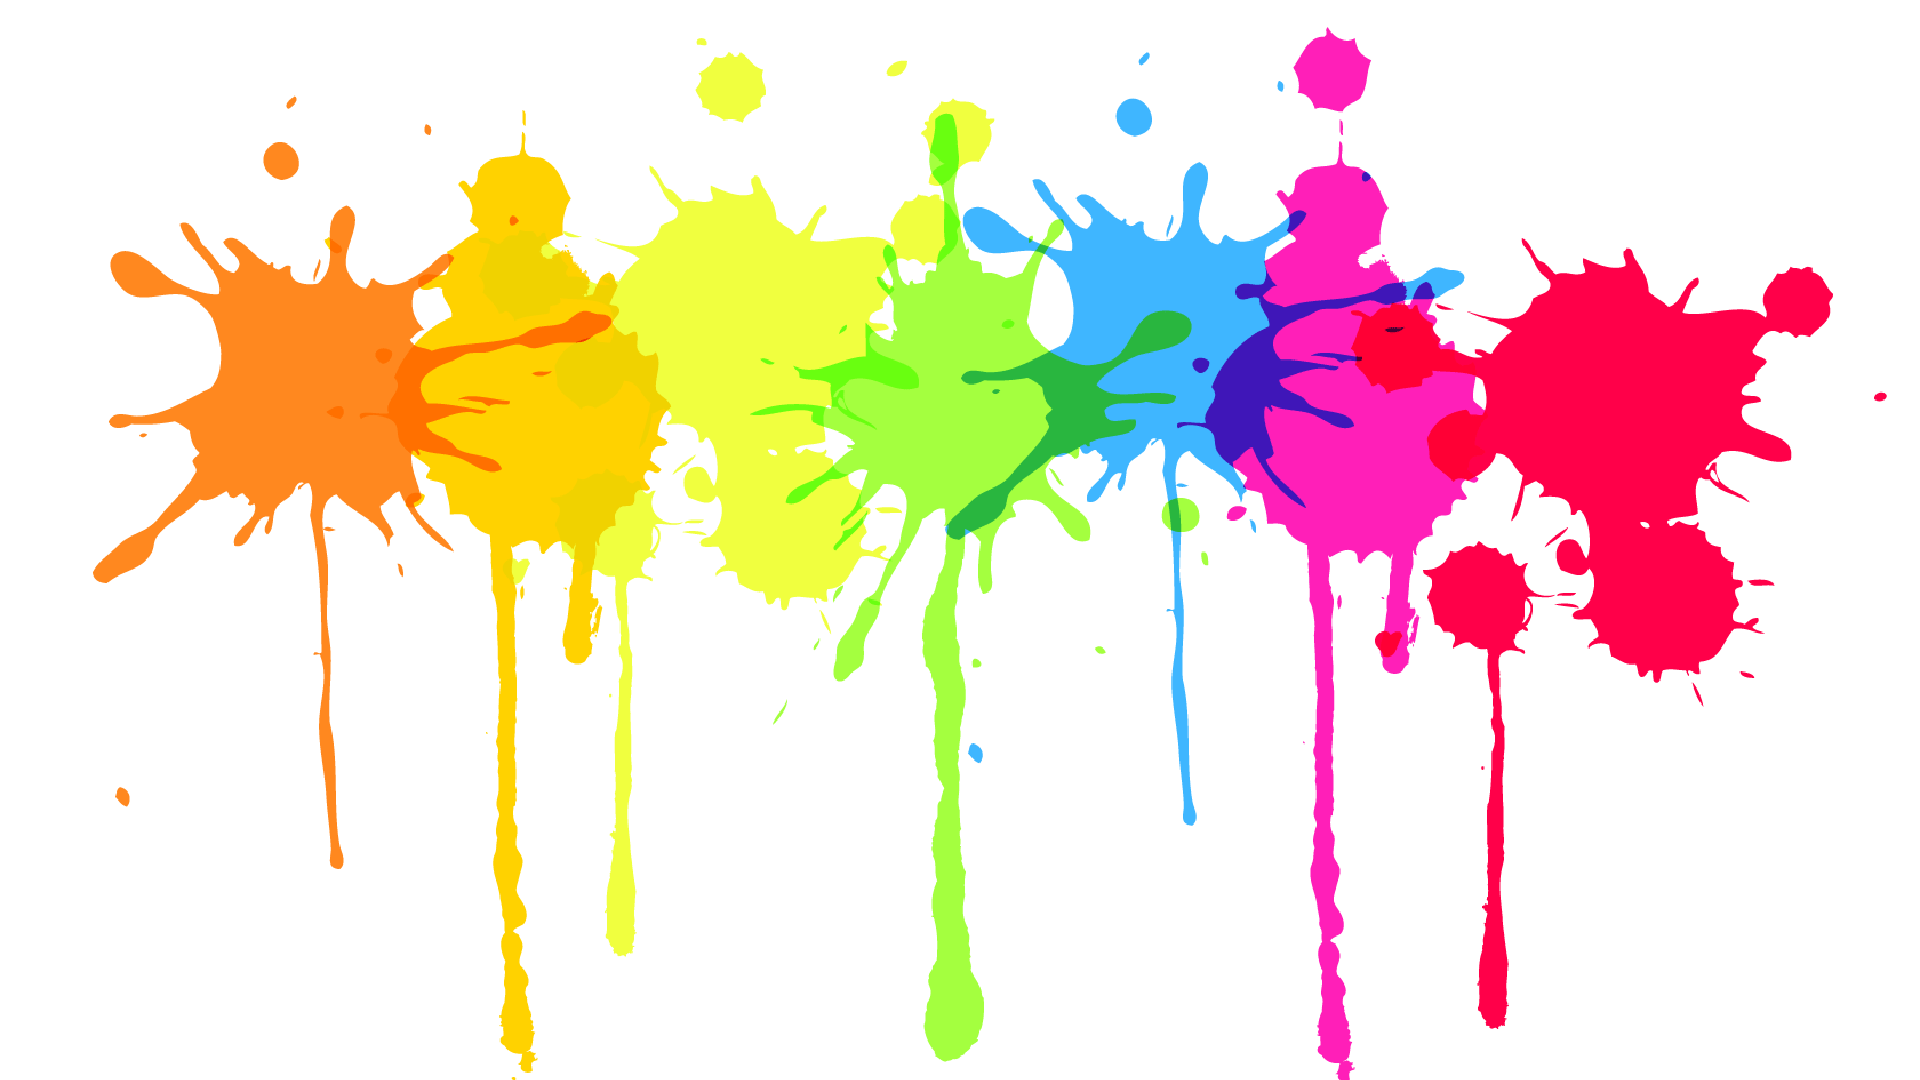 Paint clipart. Splatter panda free images